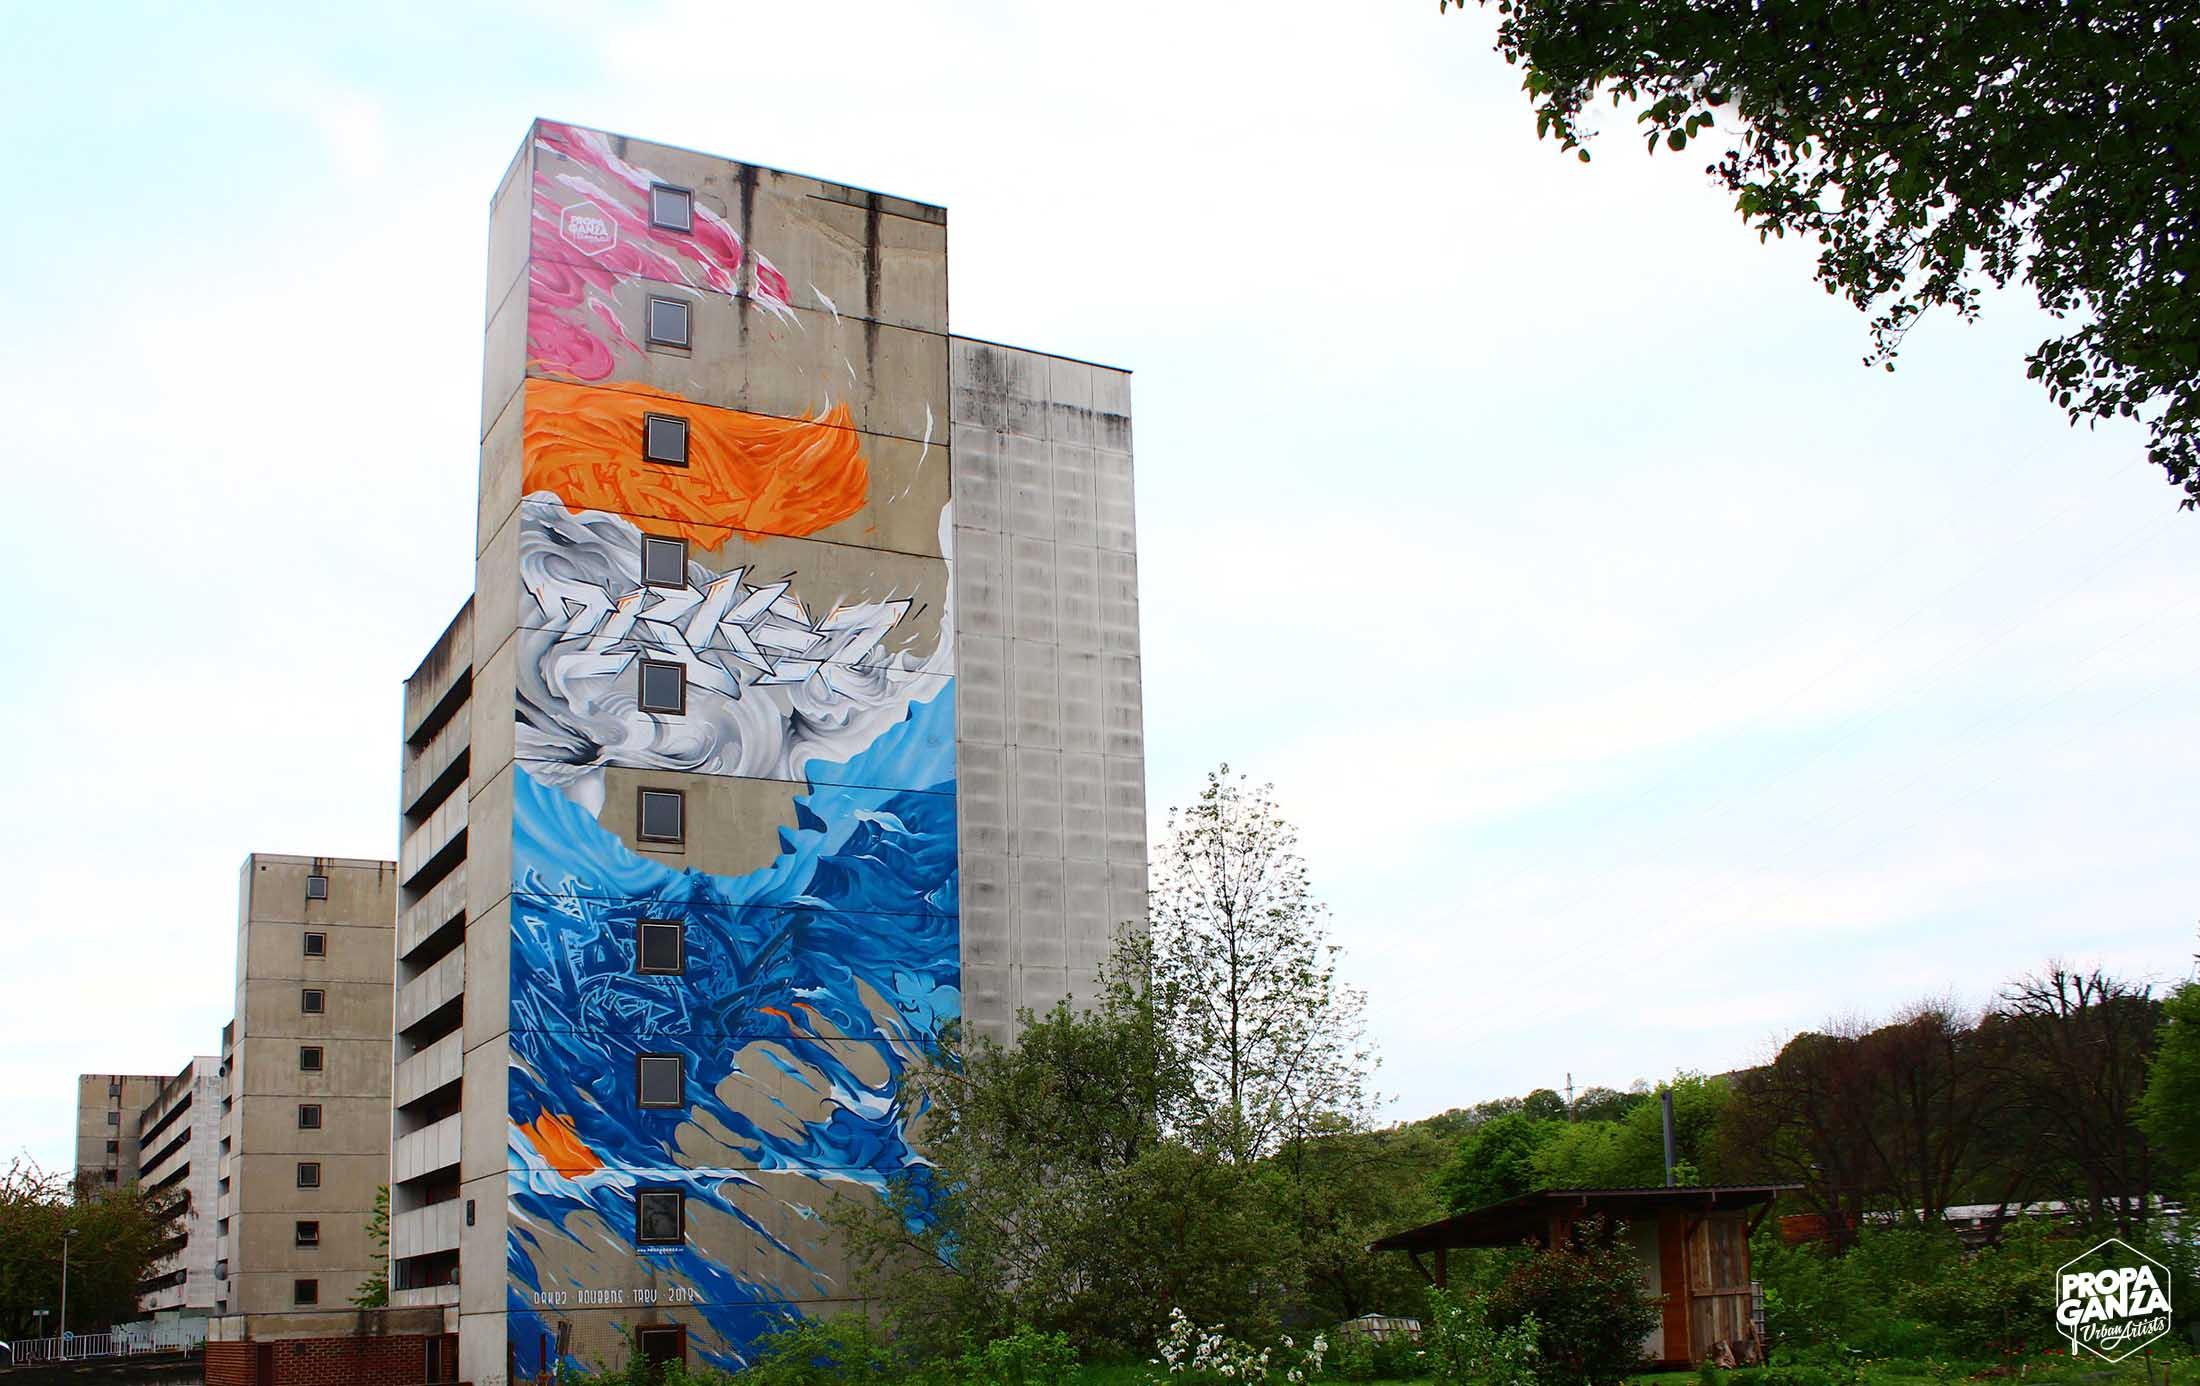 https://www.propaganza.be/wp-content/uploads/2016/05/propaganza-begium-brussels-namur-artist-graffiti-street-art-spray-painting-roubens-trevor-orkez-2018-5.jpg